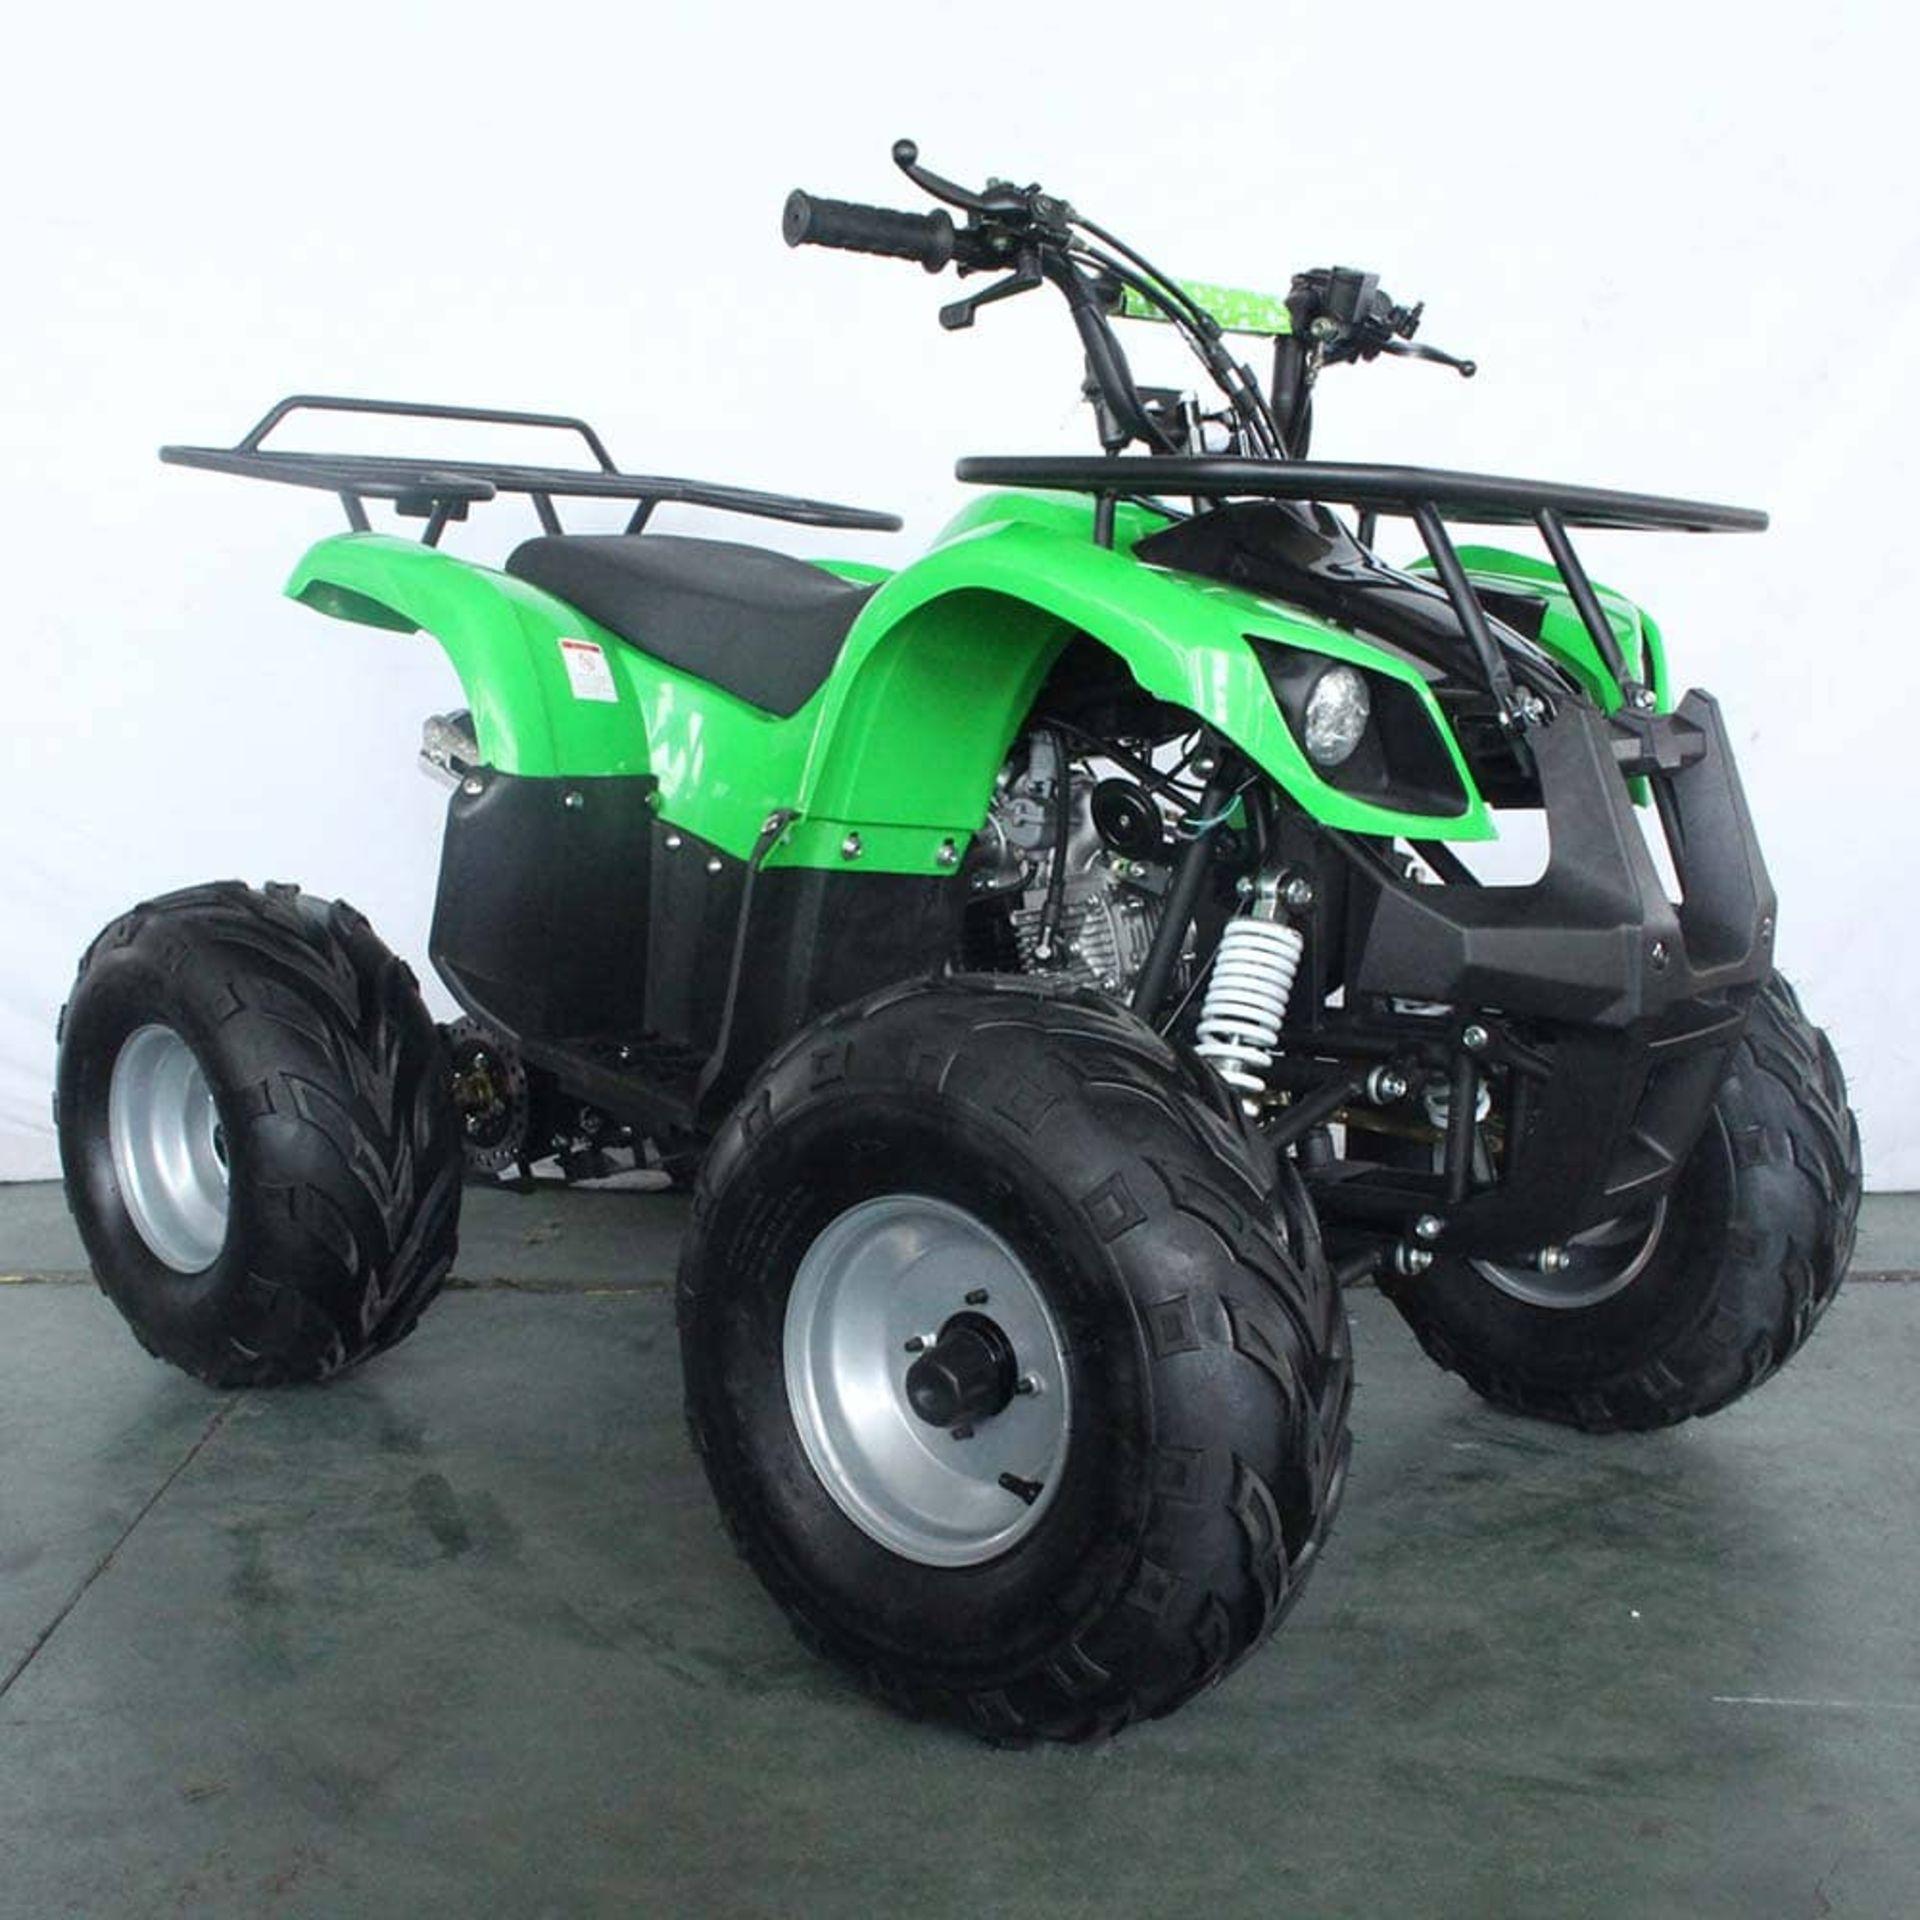 + VAT Brand New 125cc Condor Quad Bike - Four Stroke - Single Cylinder - Front Drum Brakes & Rear - Image 7 of 9